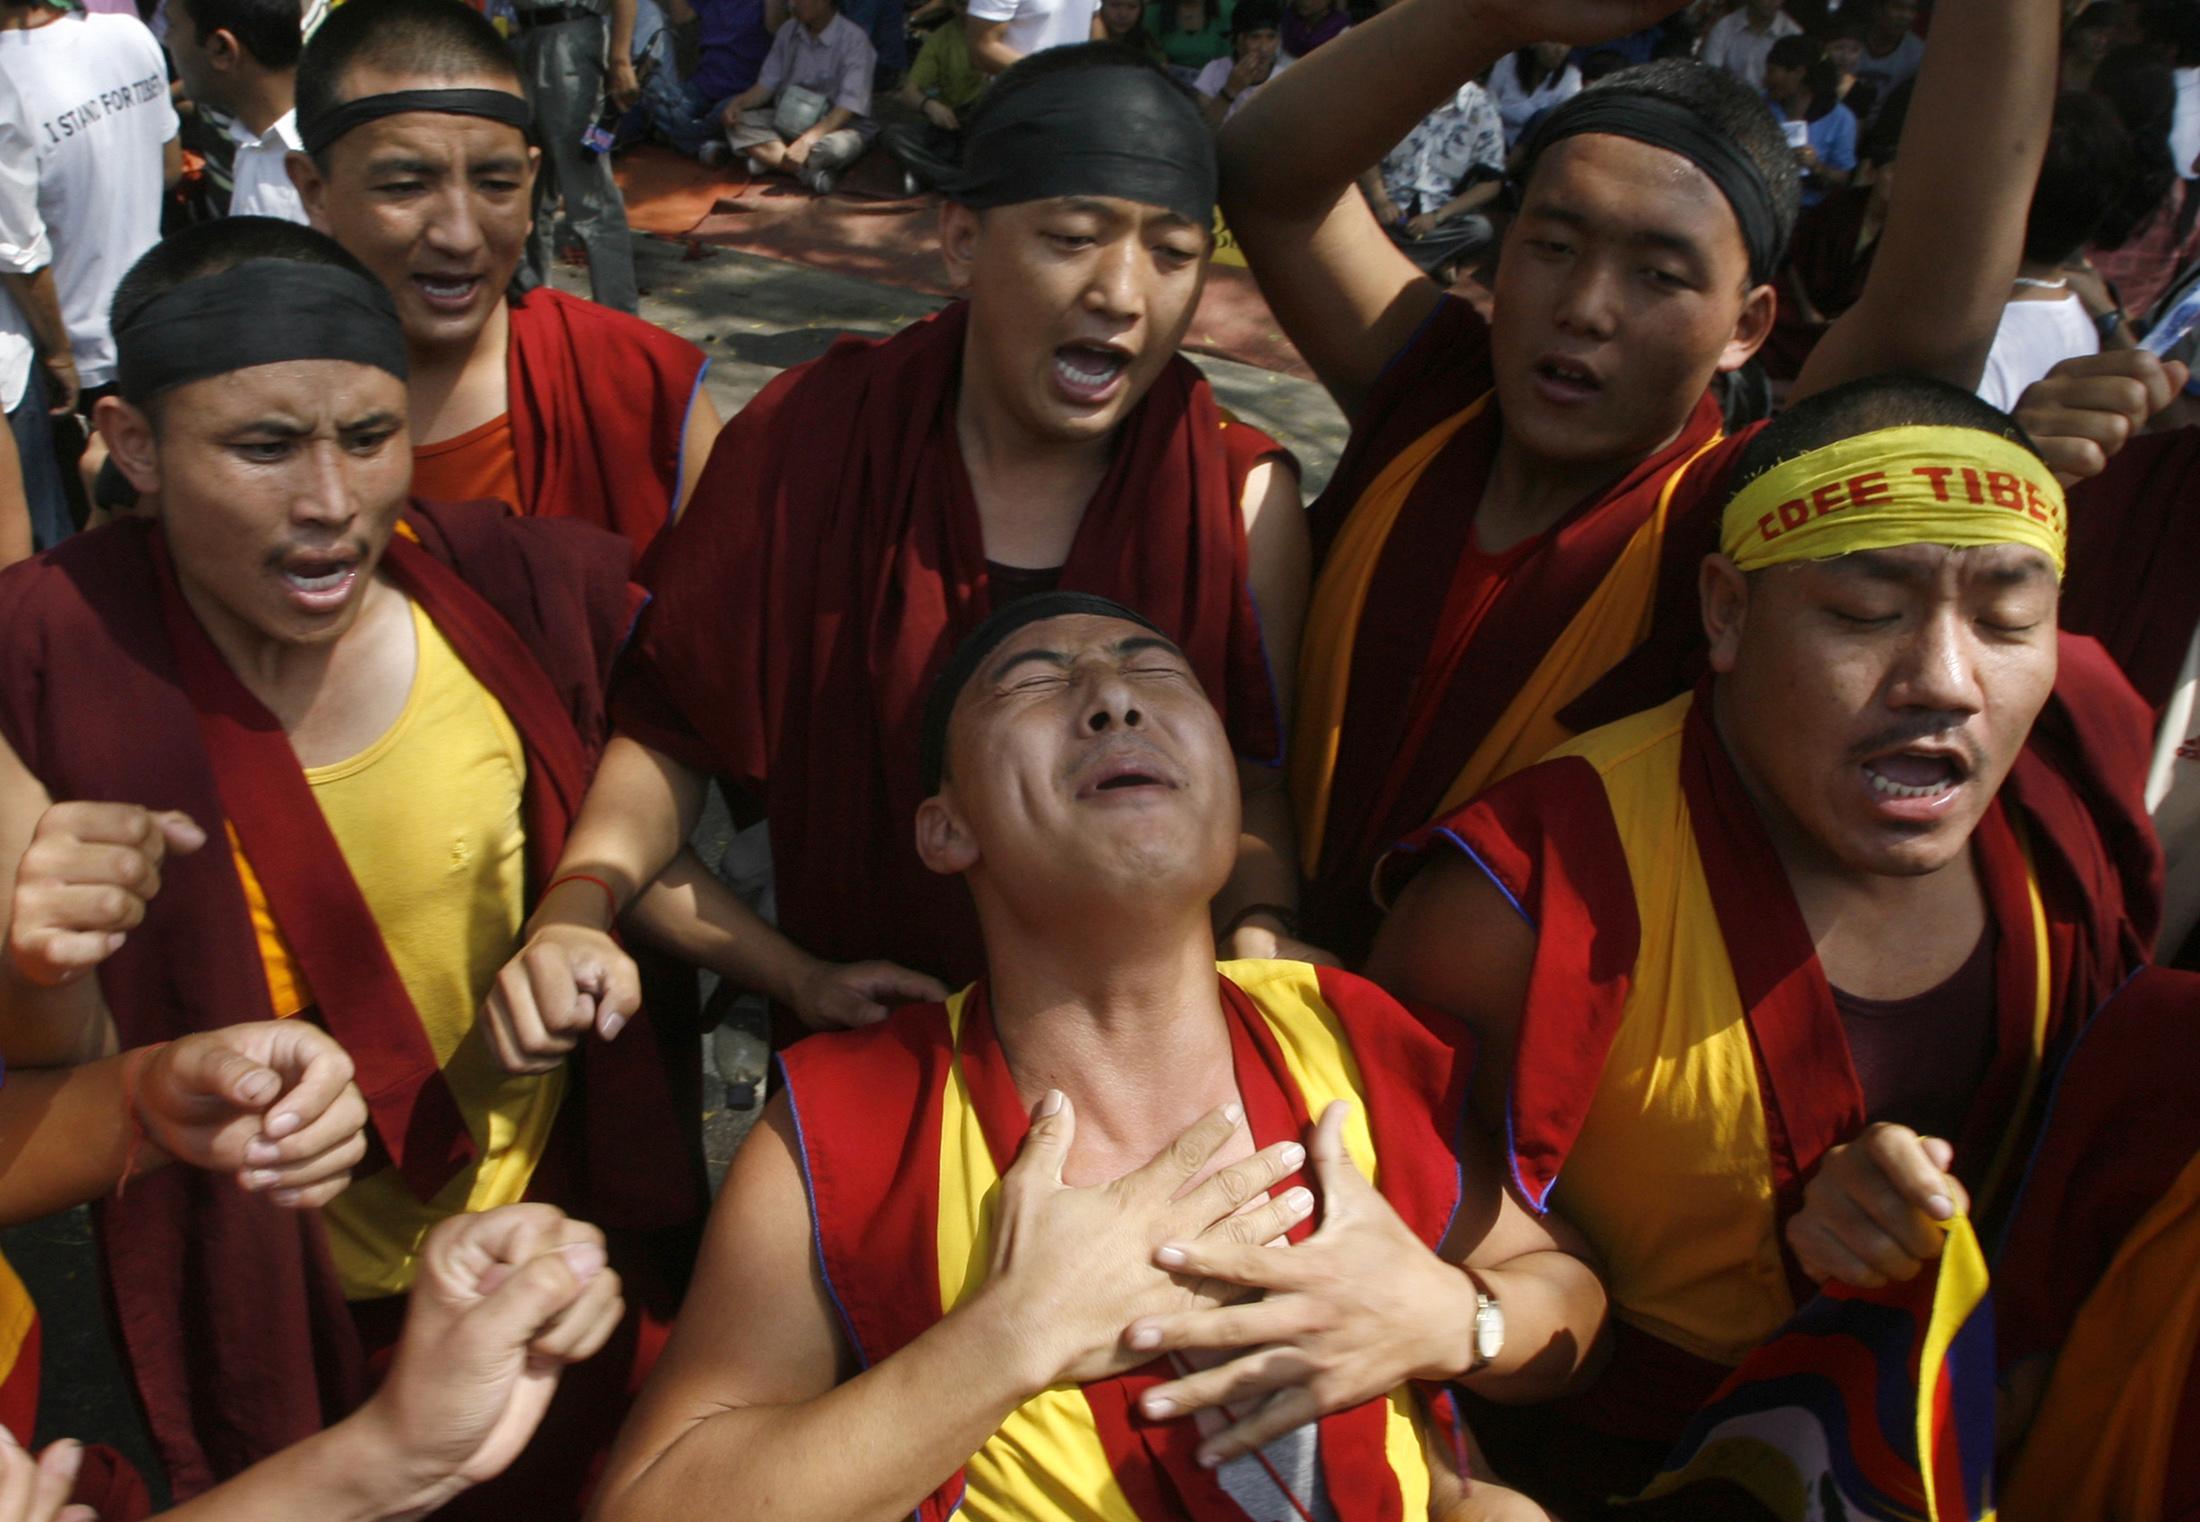 Tibetan monks shout slogans during a protest in New Delhi